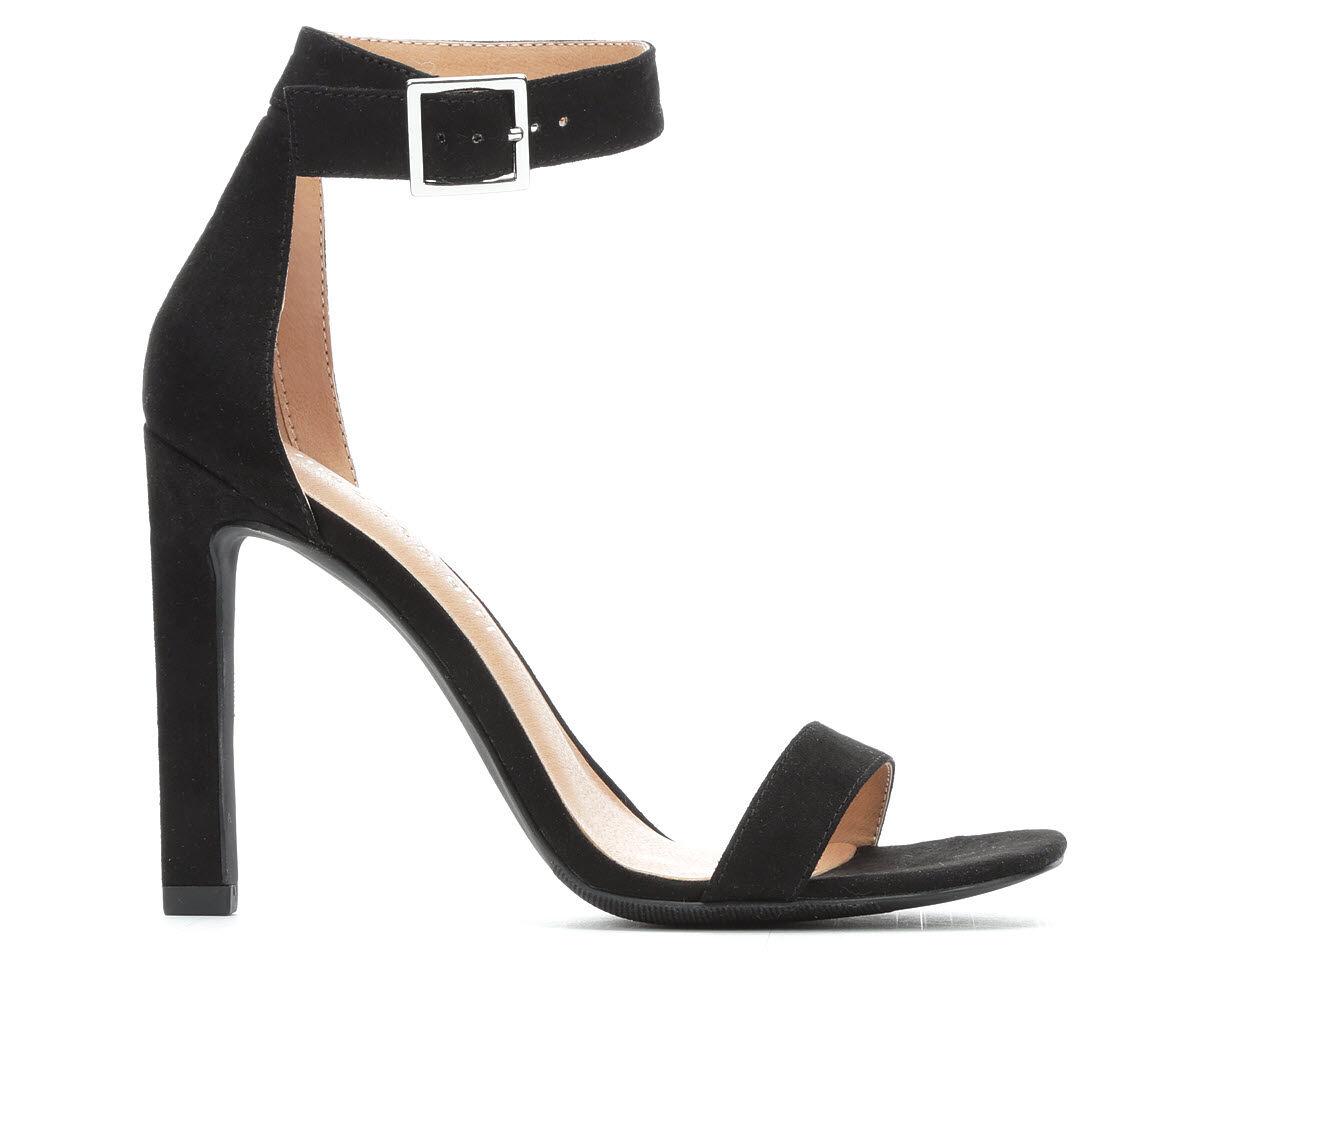 Women's Madden Girl Ara Dress Sandals Black